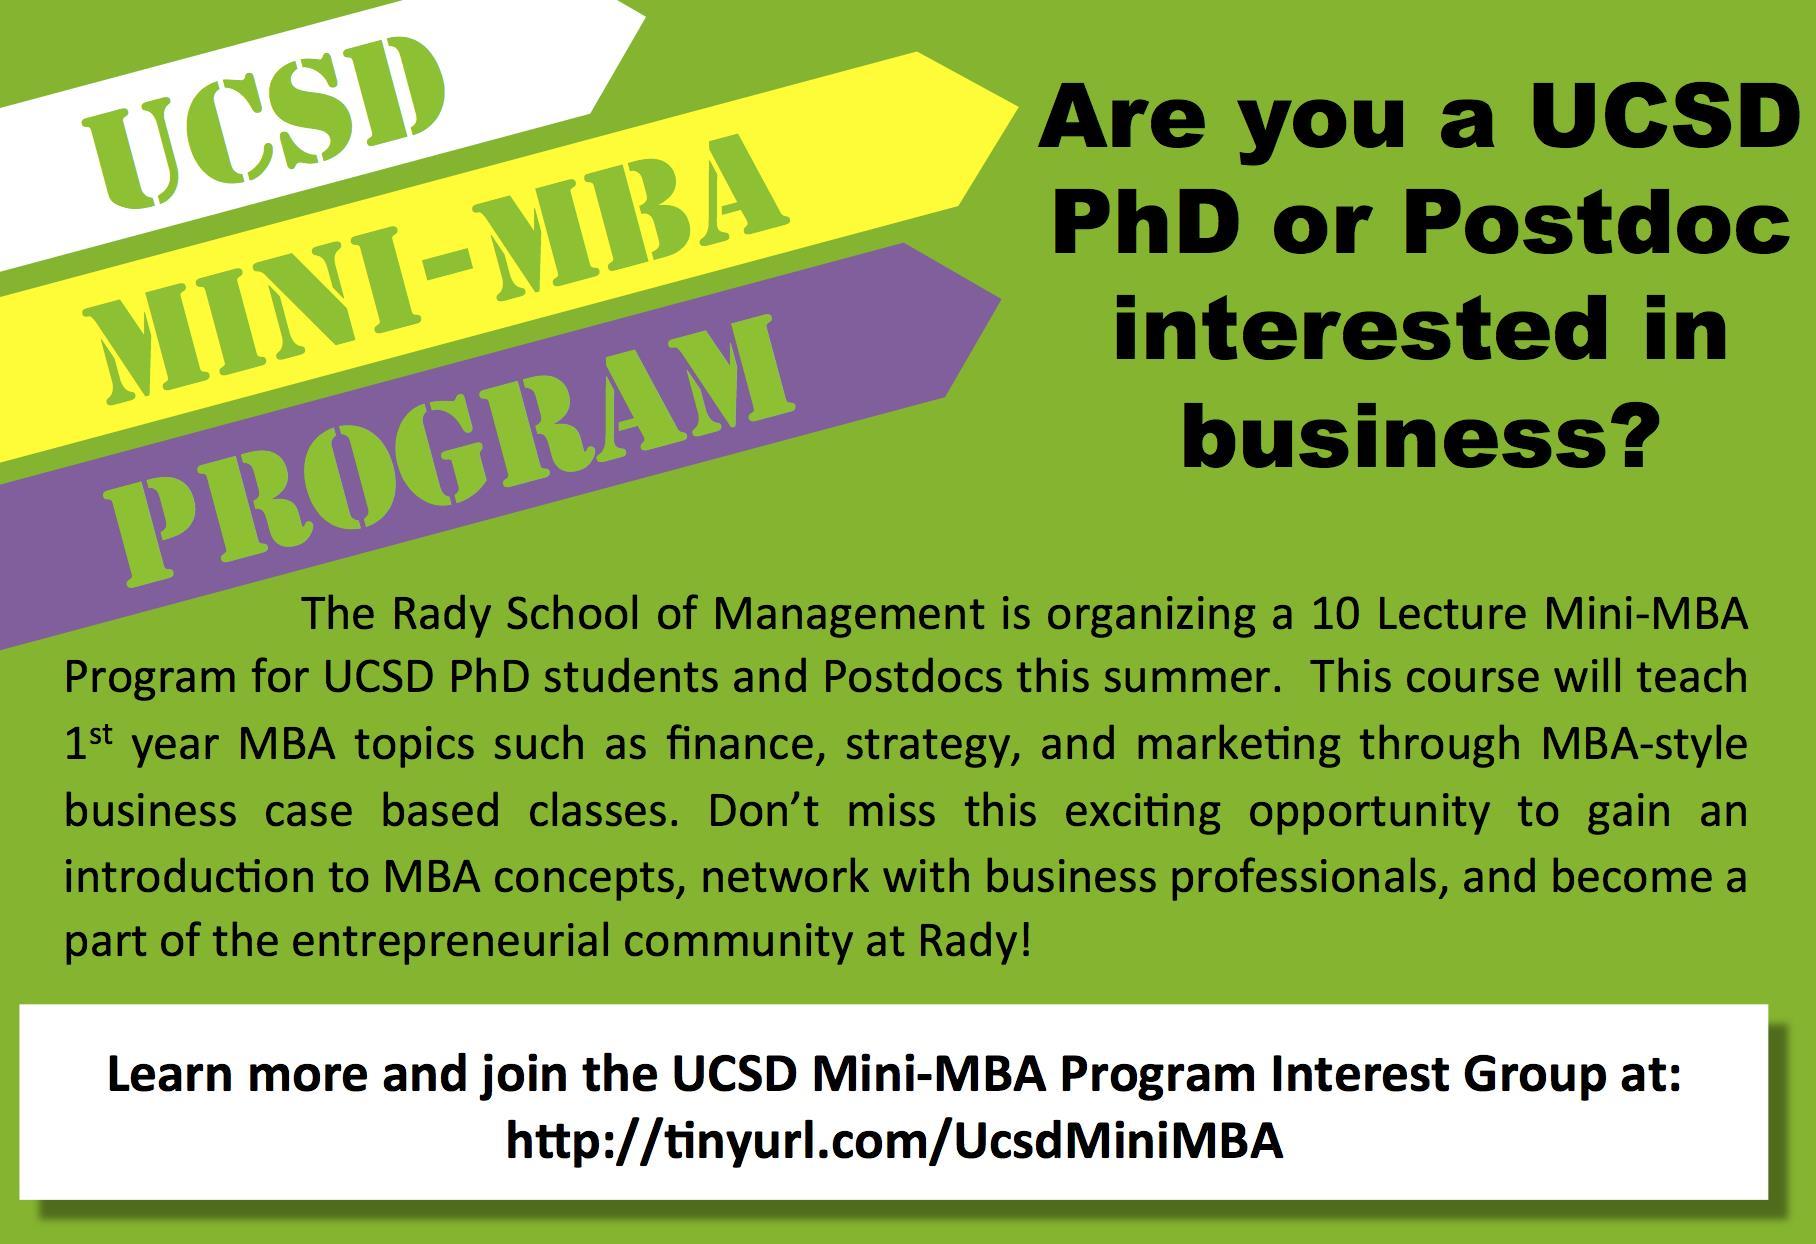 NEW Rady Mini-MBA Course for UCSD PhDs/Postdocs | UCSD Chemistry